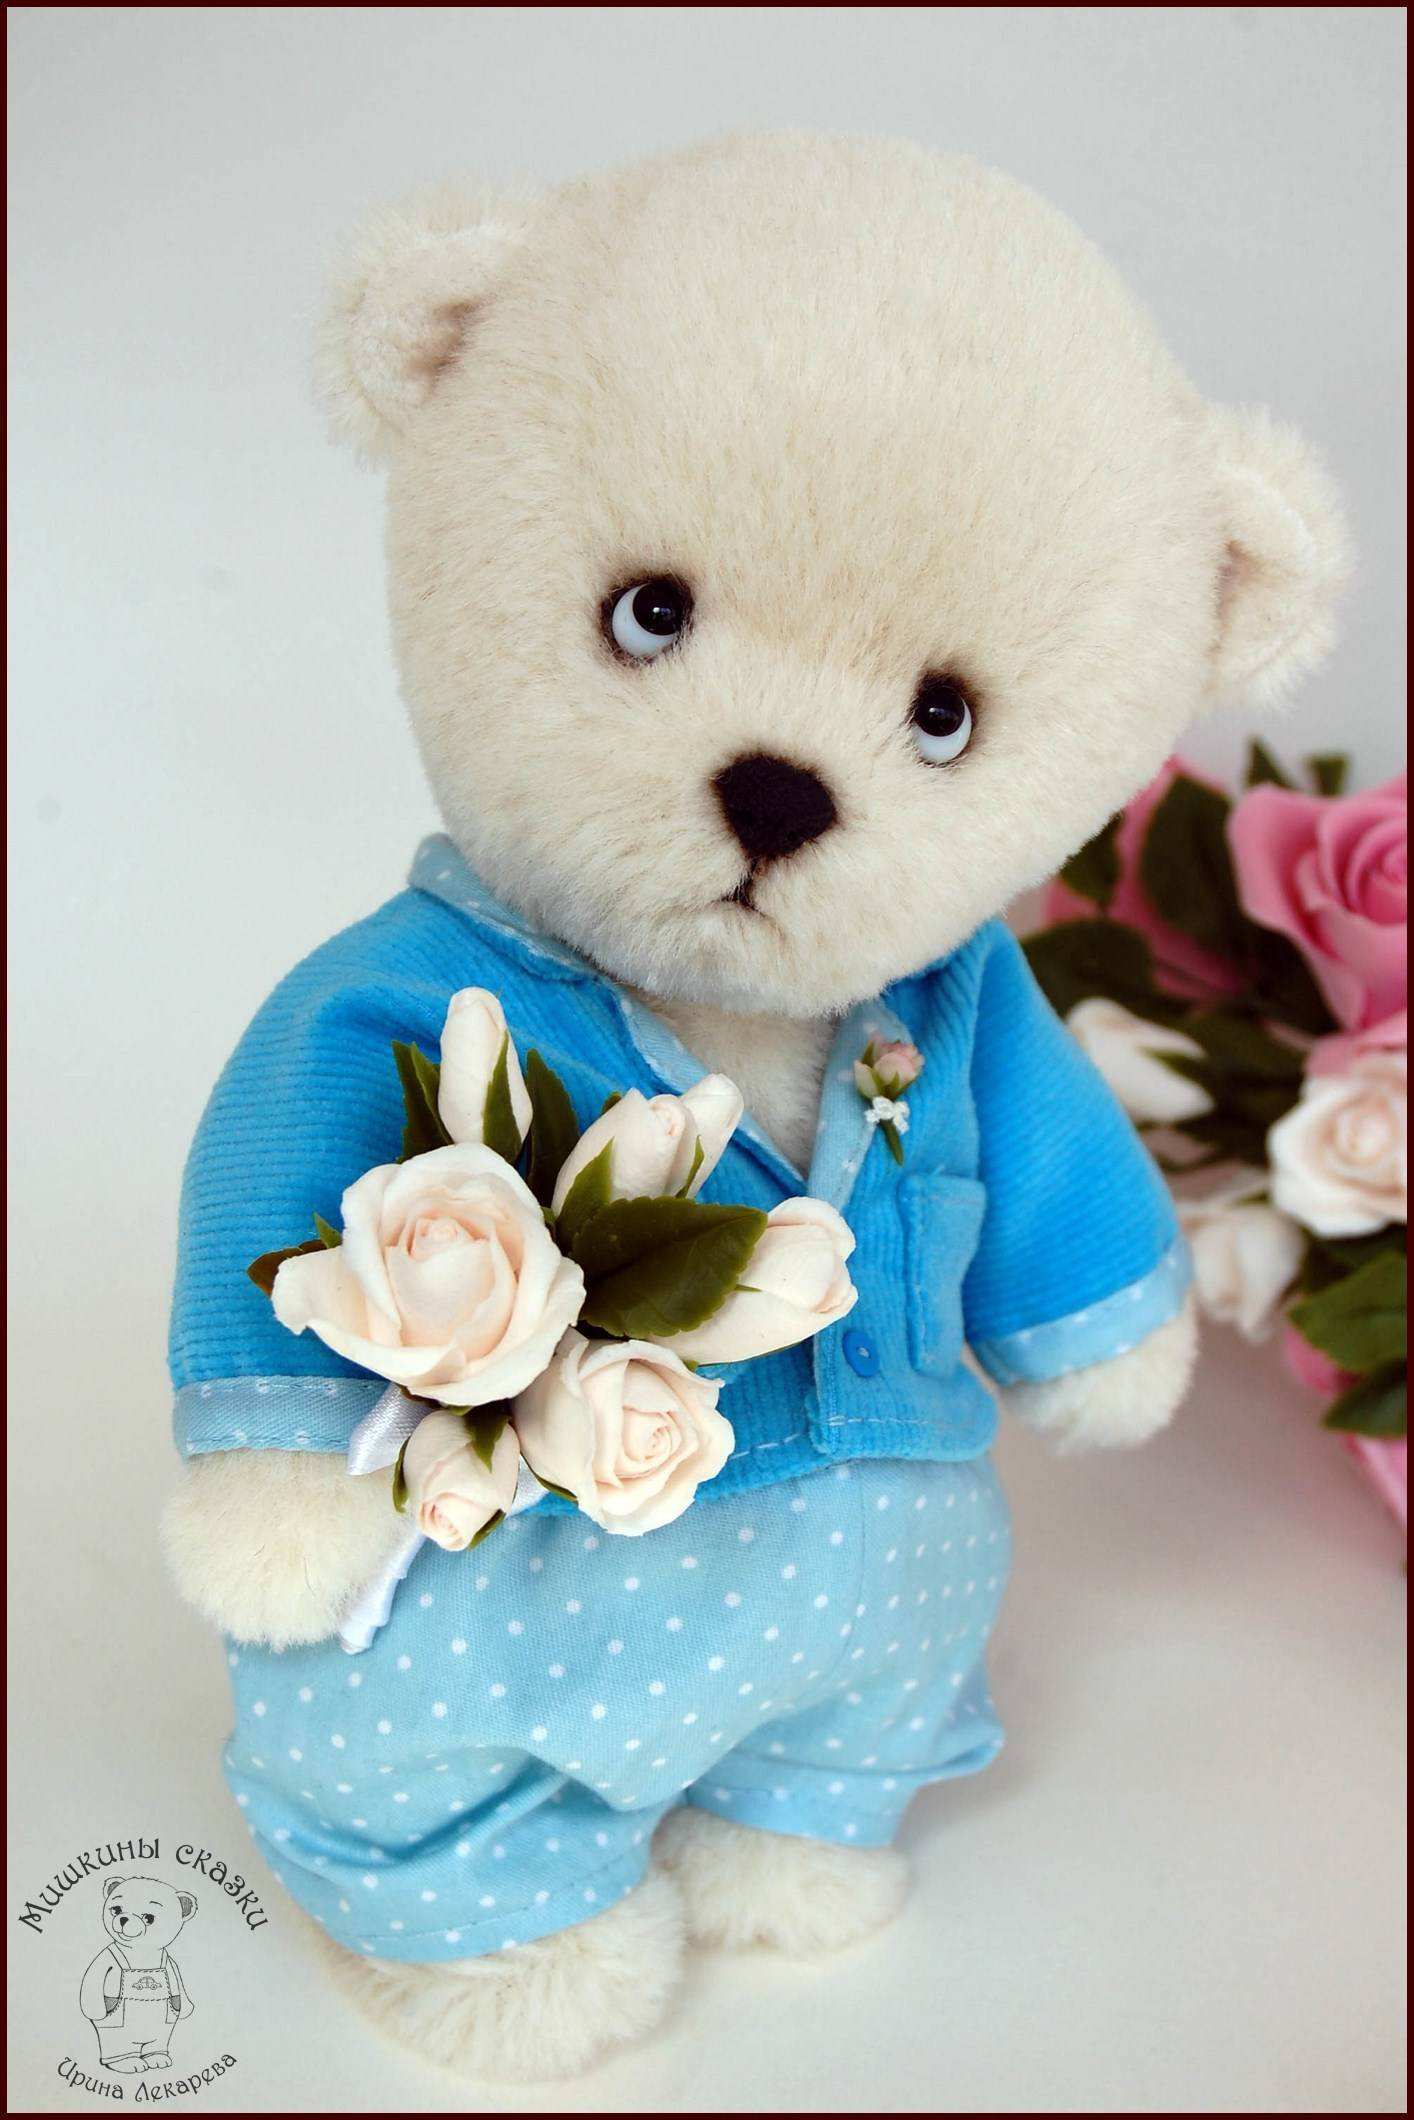 TeddyTales